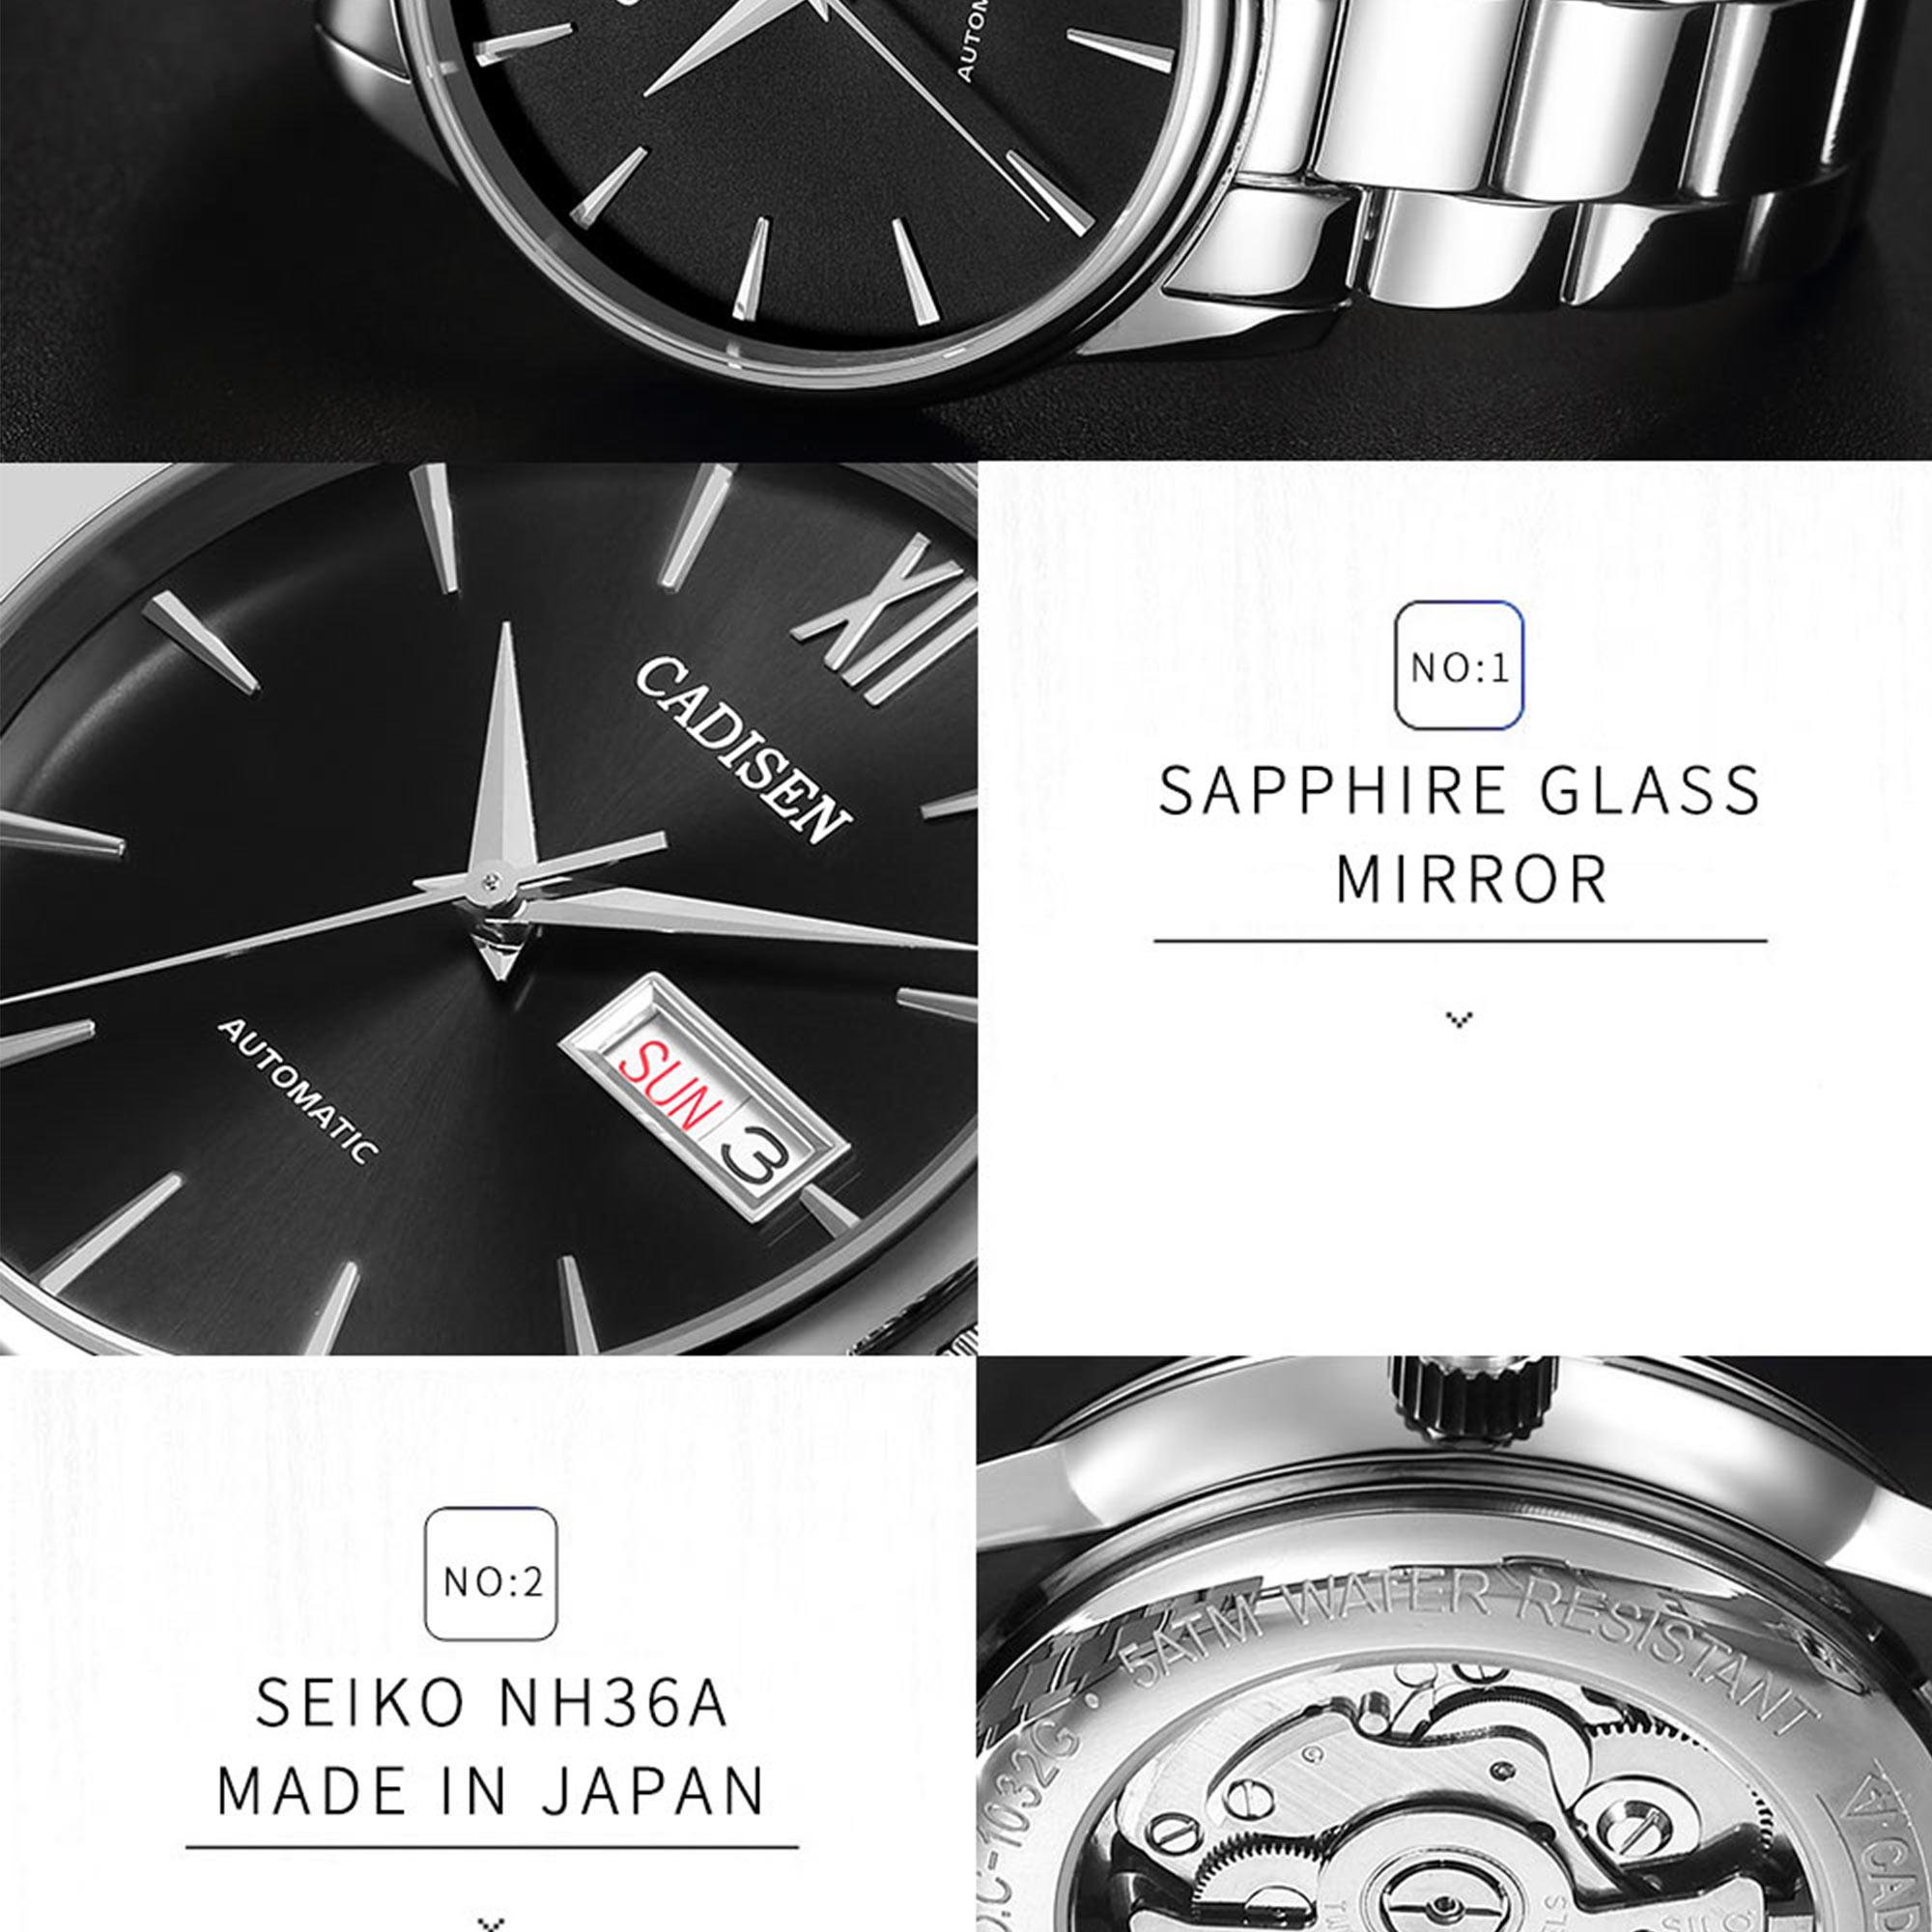 Ha6611a68fcd4427c8cf937eeb3303ce85 CADISEN Men Watch Automatic Mechanical Watches Role Date Week Top Luxury Brand Japan NH36A Wrist watch Clock Relogio Masculino